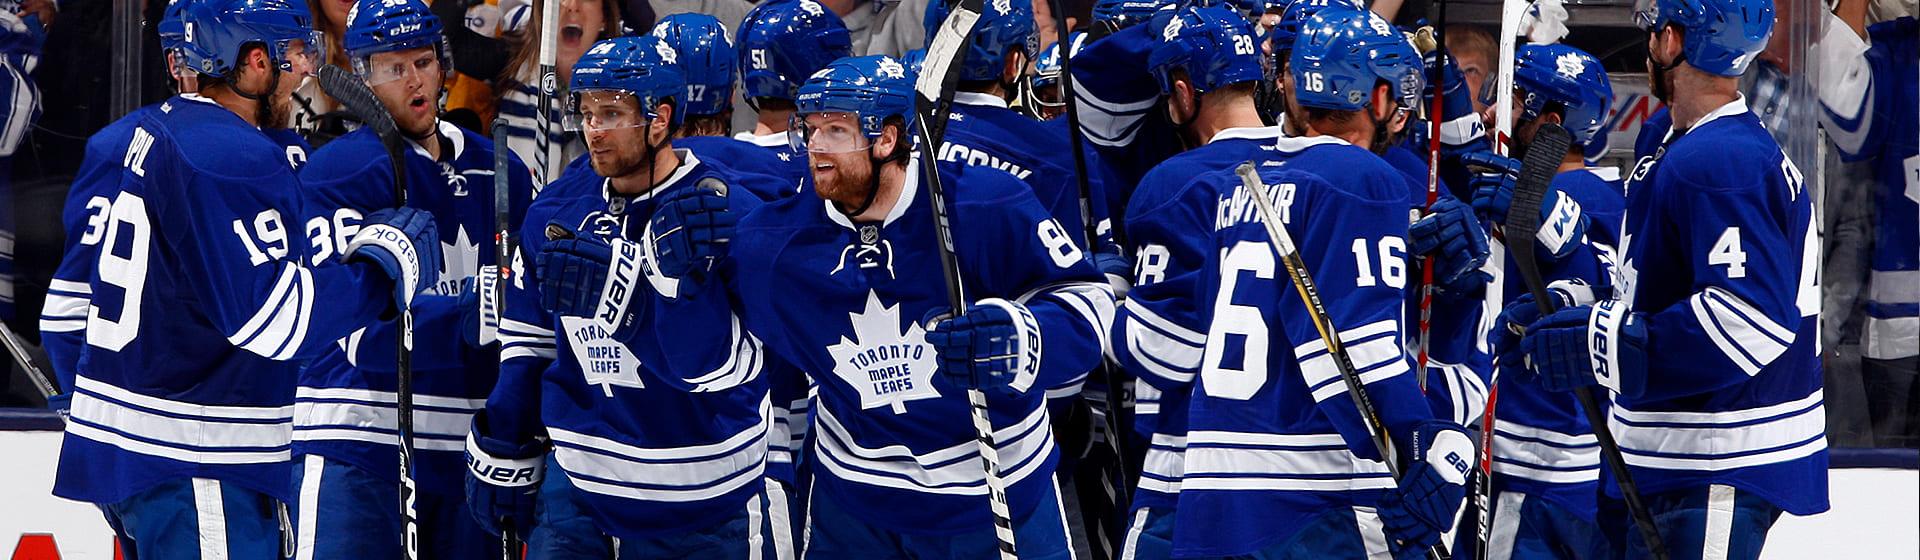 Toronto Maple Leafs - Мерч и одежда с атрибутикой